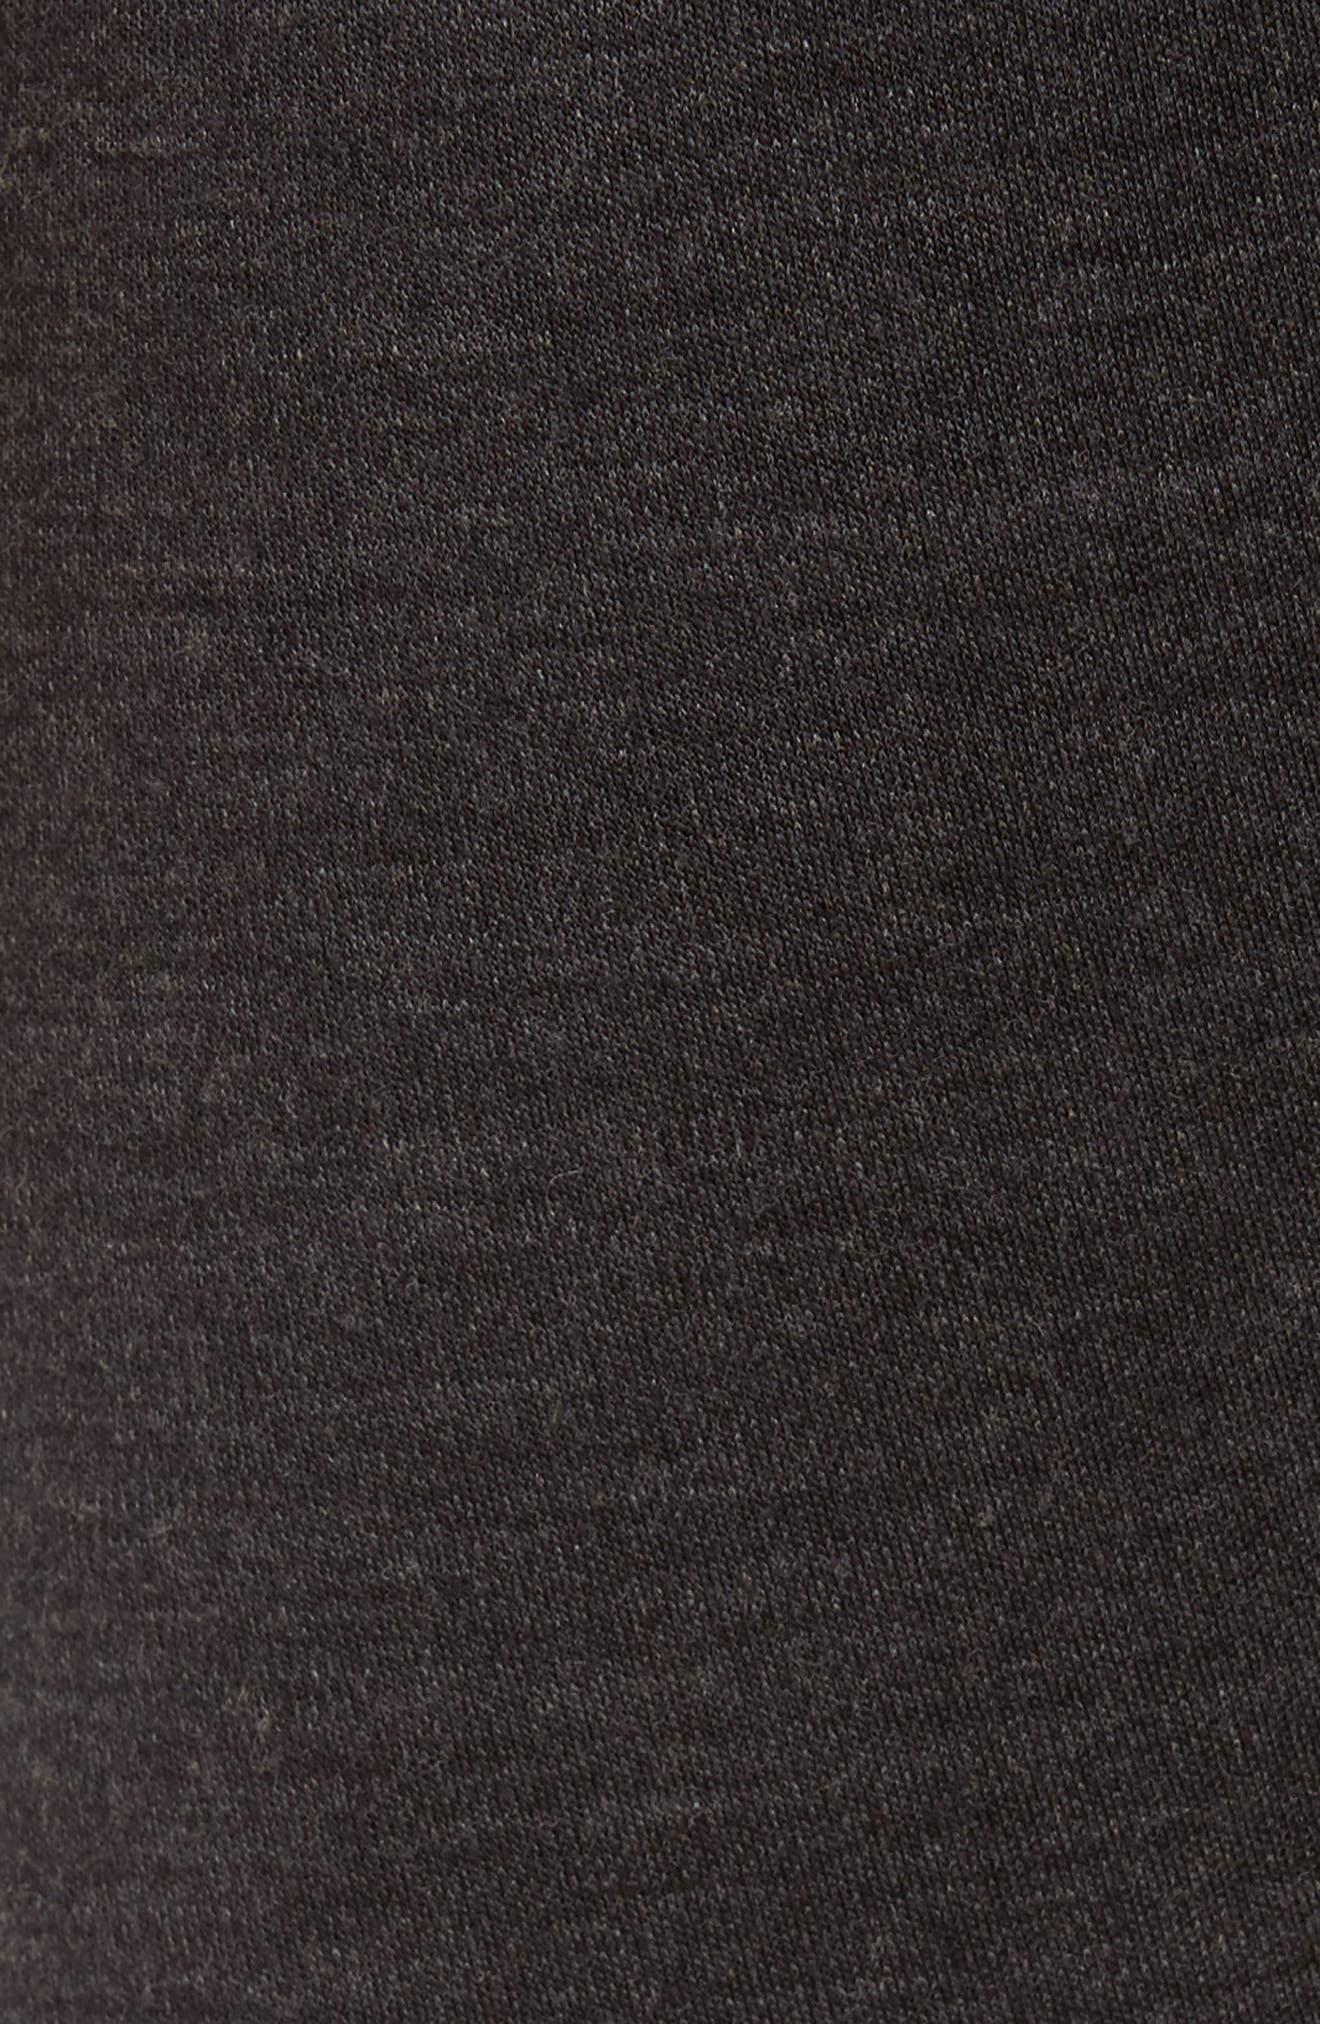 Merino 250 Base Layer Bottoms,                             Alternate thumbnail 5, color,                             CHARCOAL HEATHER